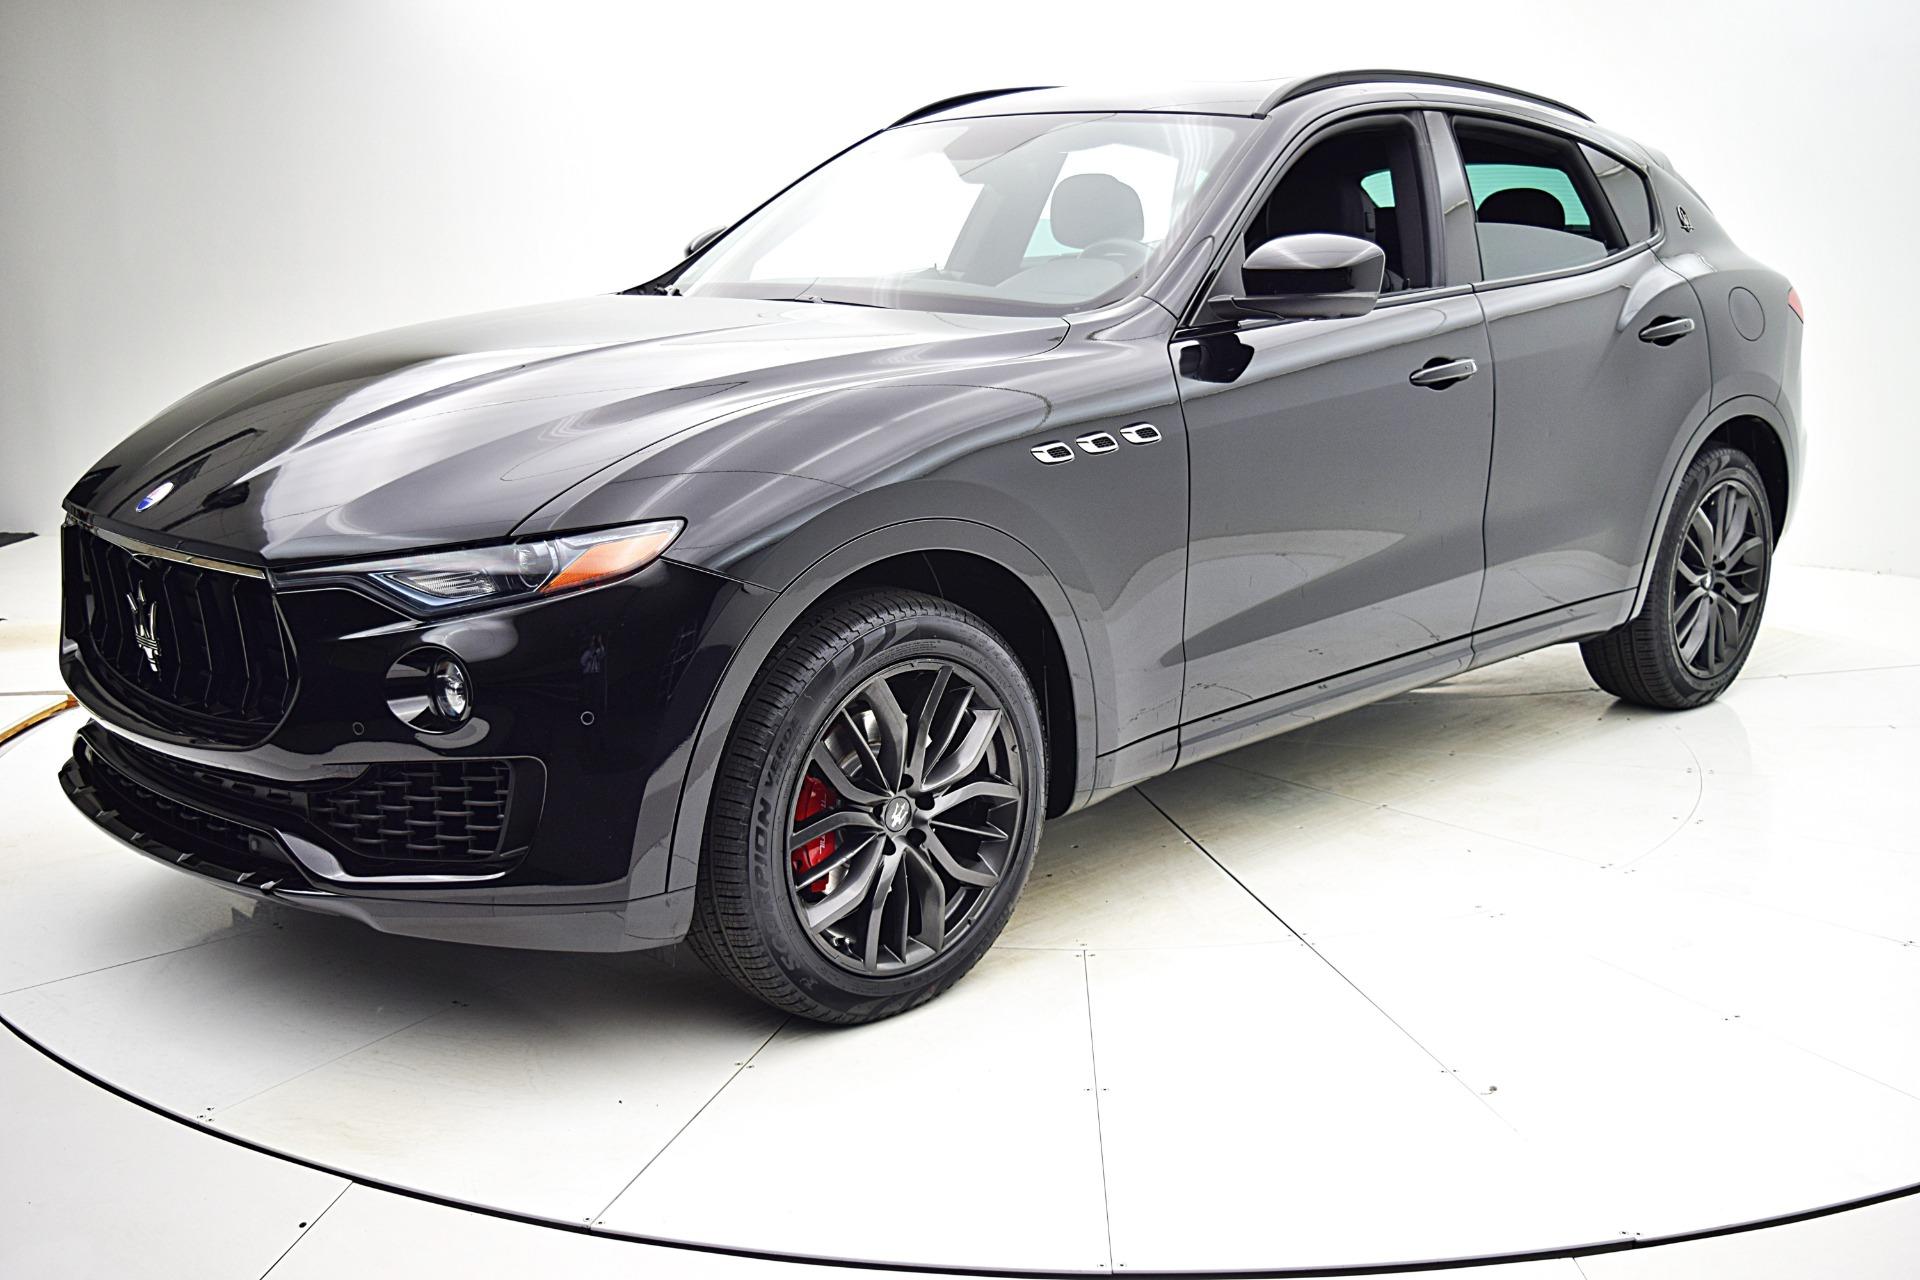 Used 2018 Maserati Levante for sale Sold at Bentley Palmyra N.J. in Palmyra NJ 08065 2